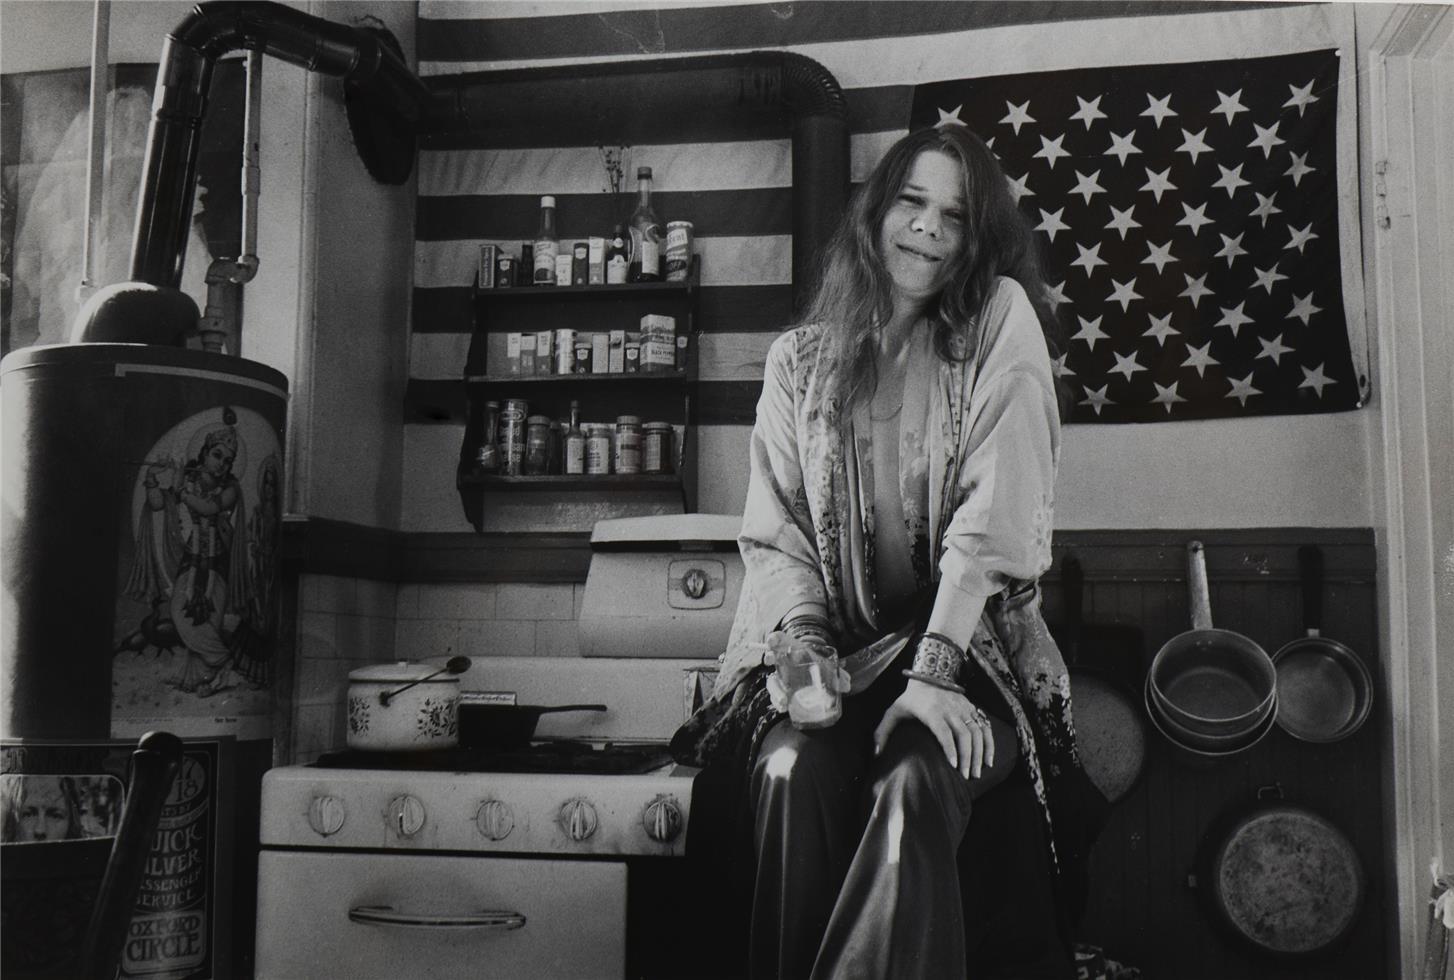 1969. Дженис Джоплин на кухне